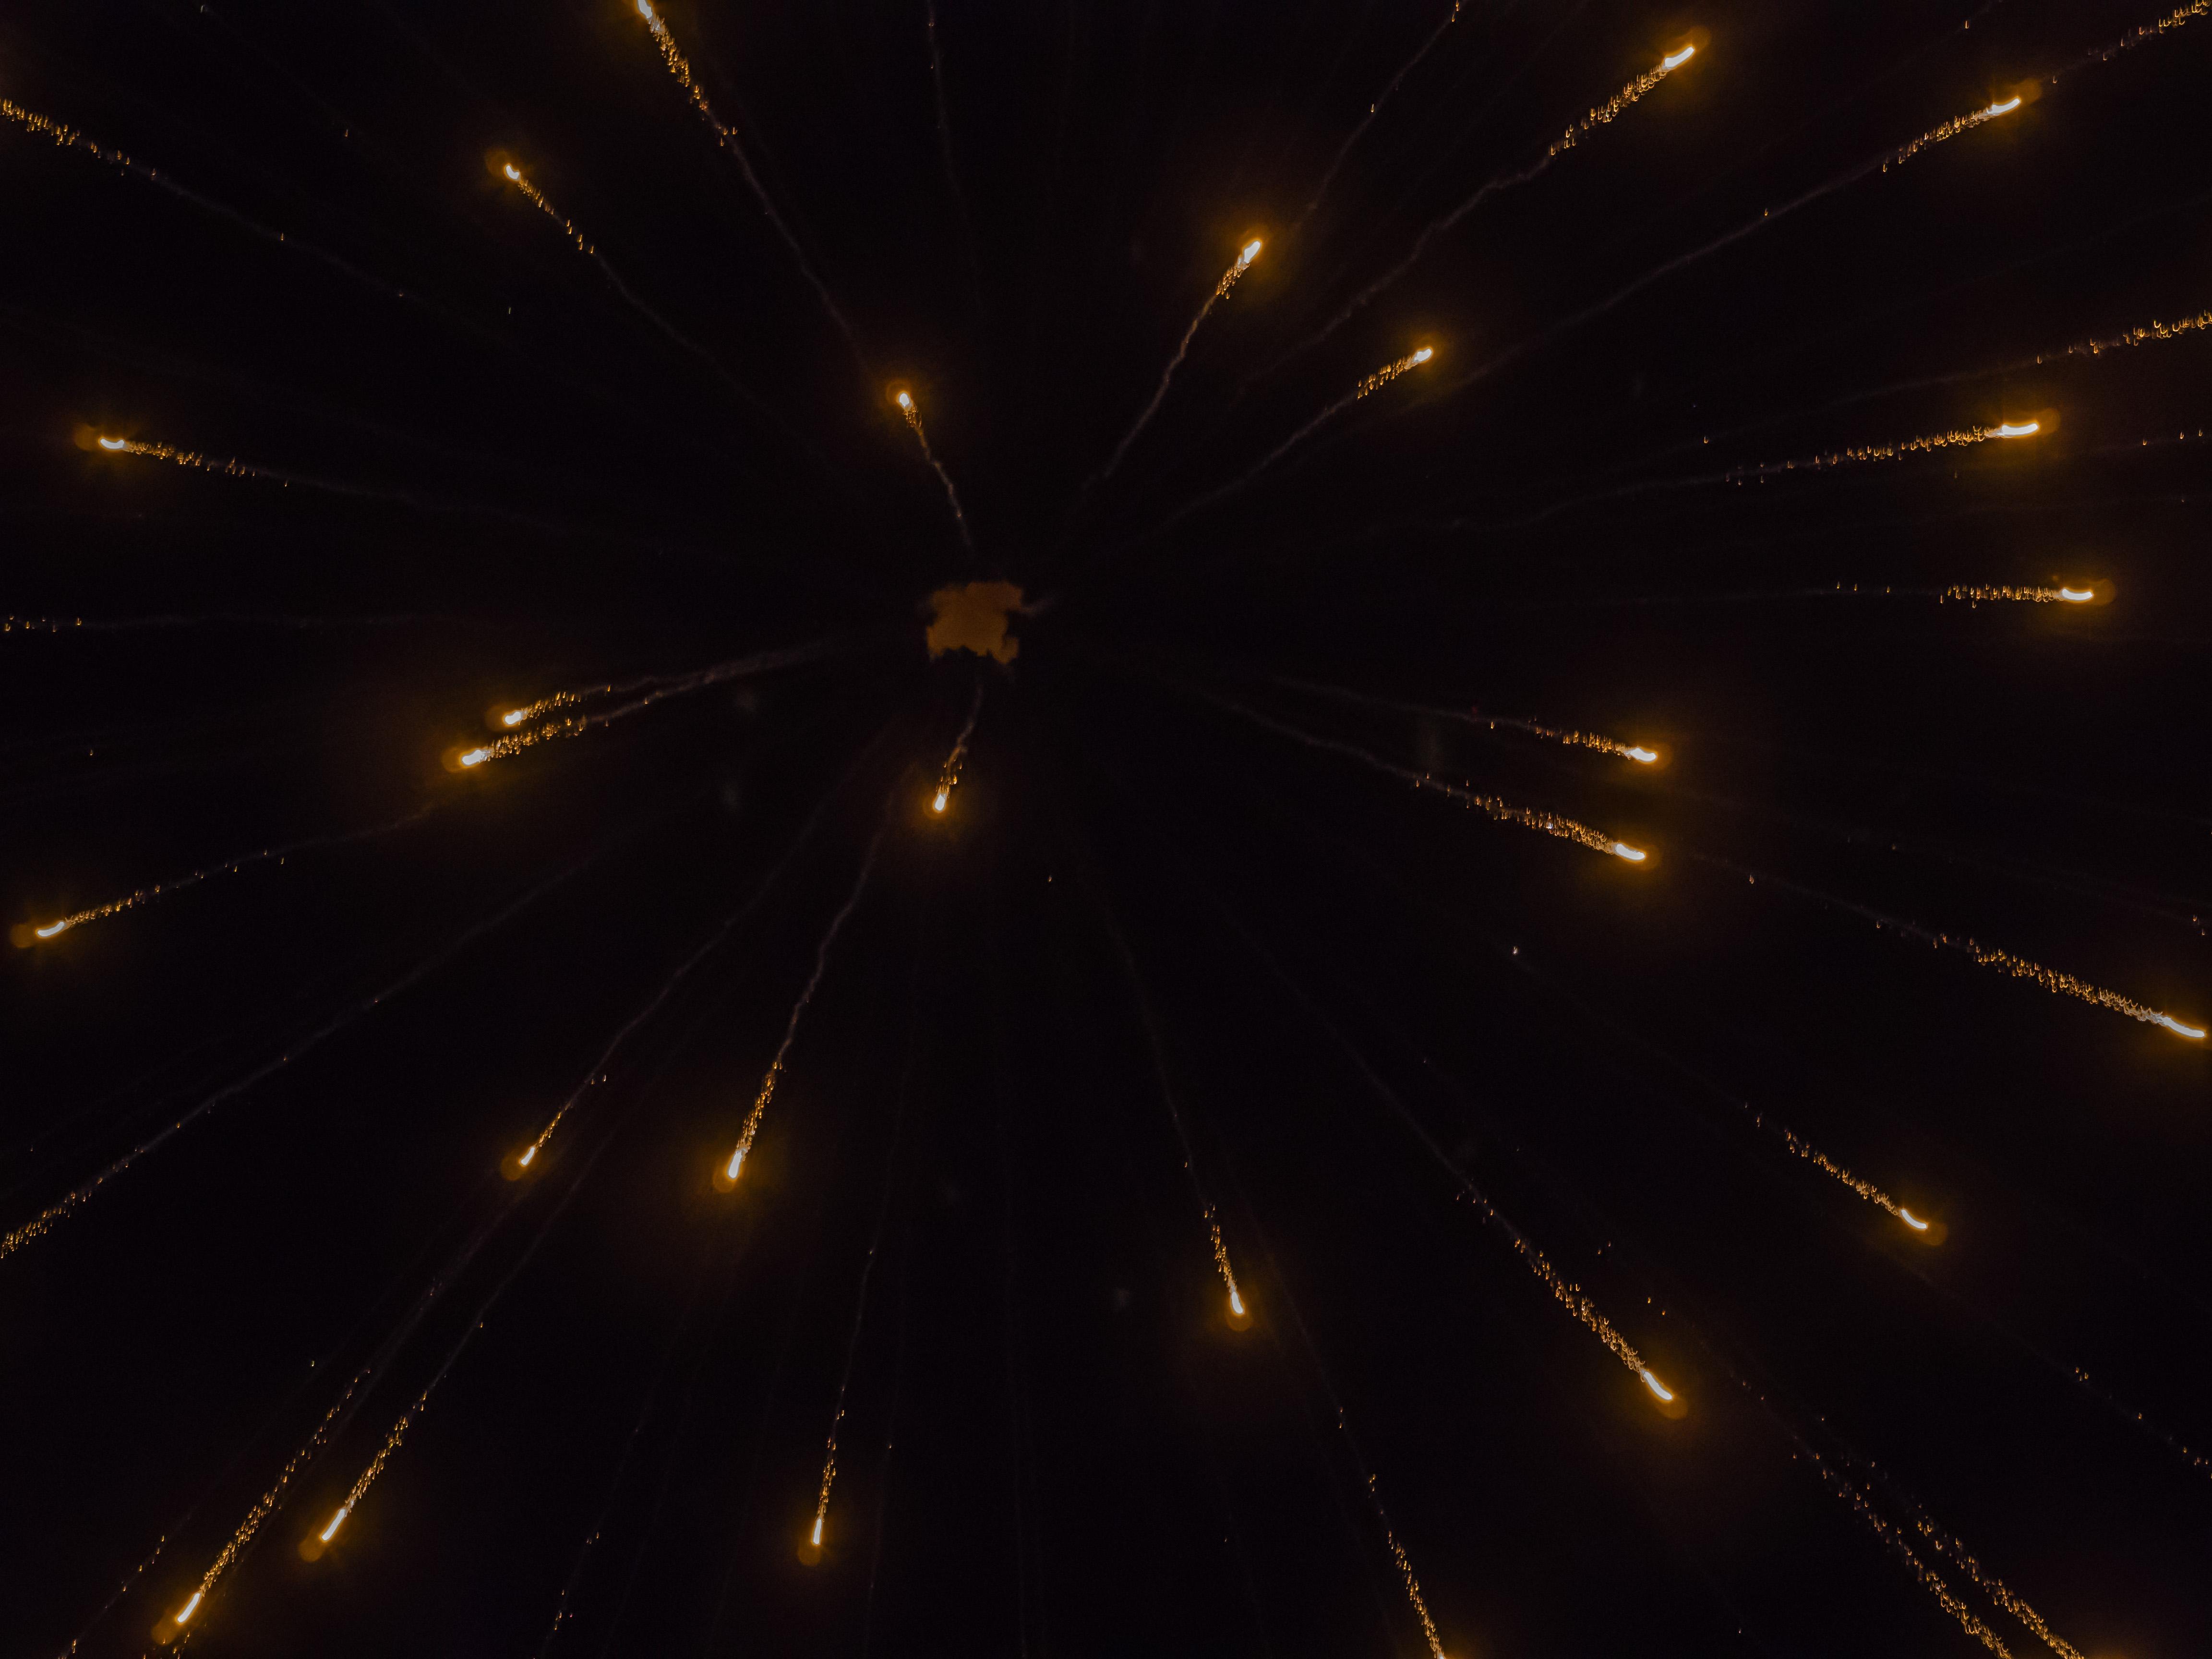 St cyprien pre bastille day fireworks at garrit-france-em10-20150713-p7130272.jpg photo